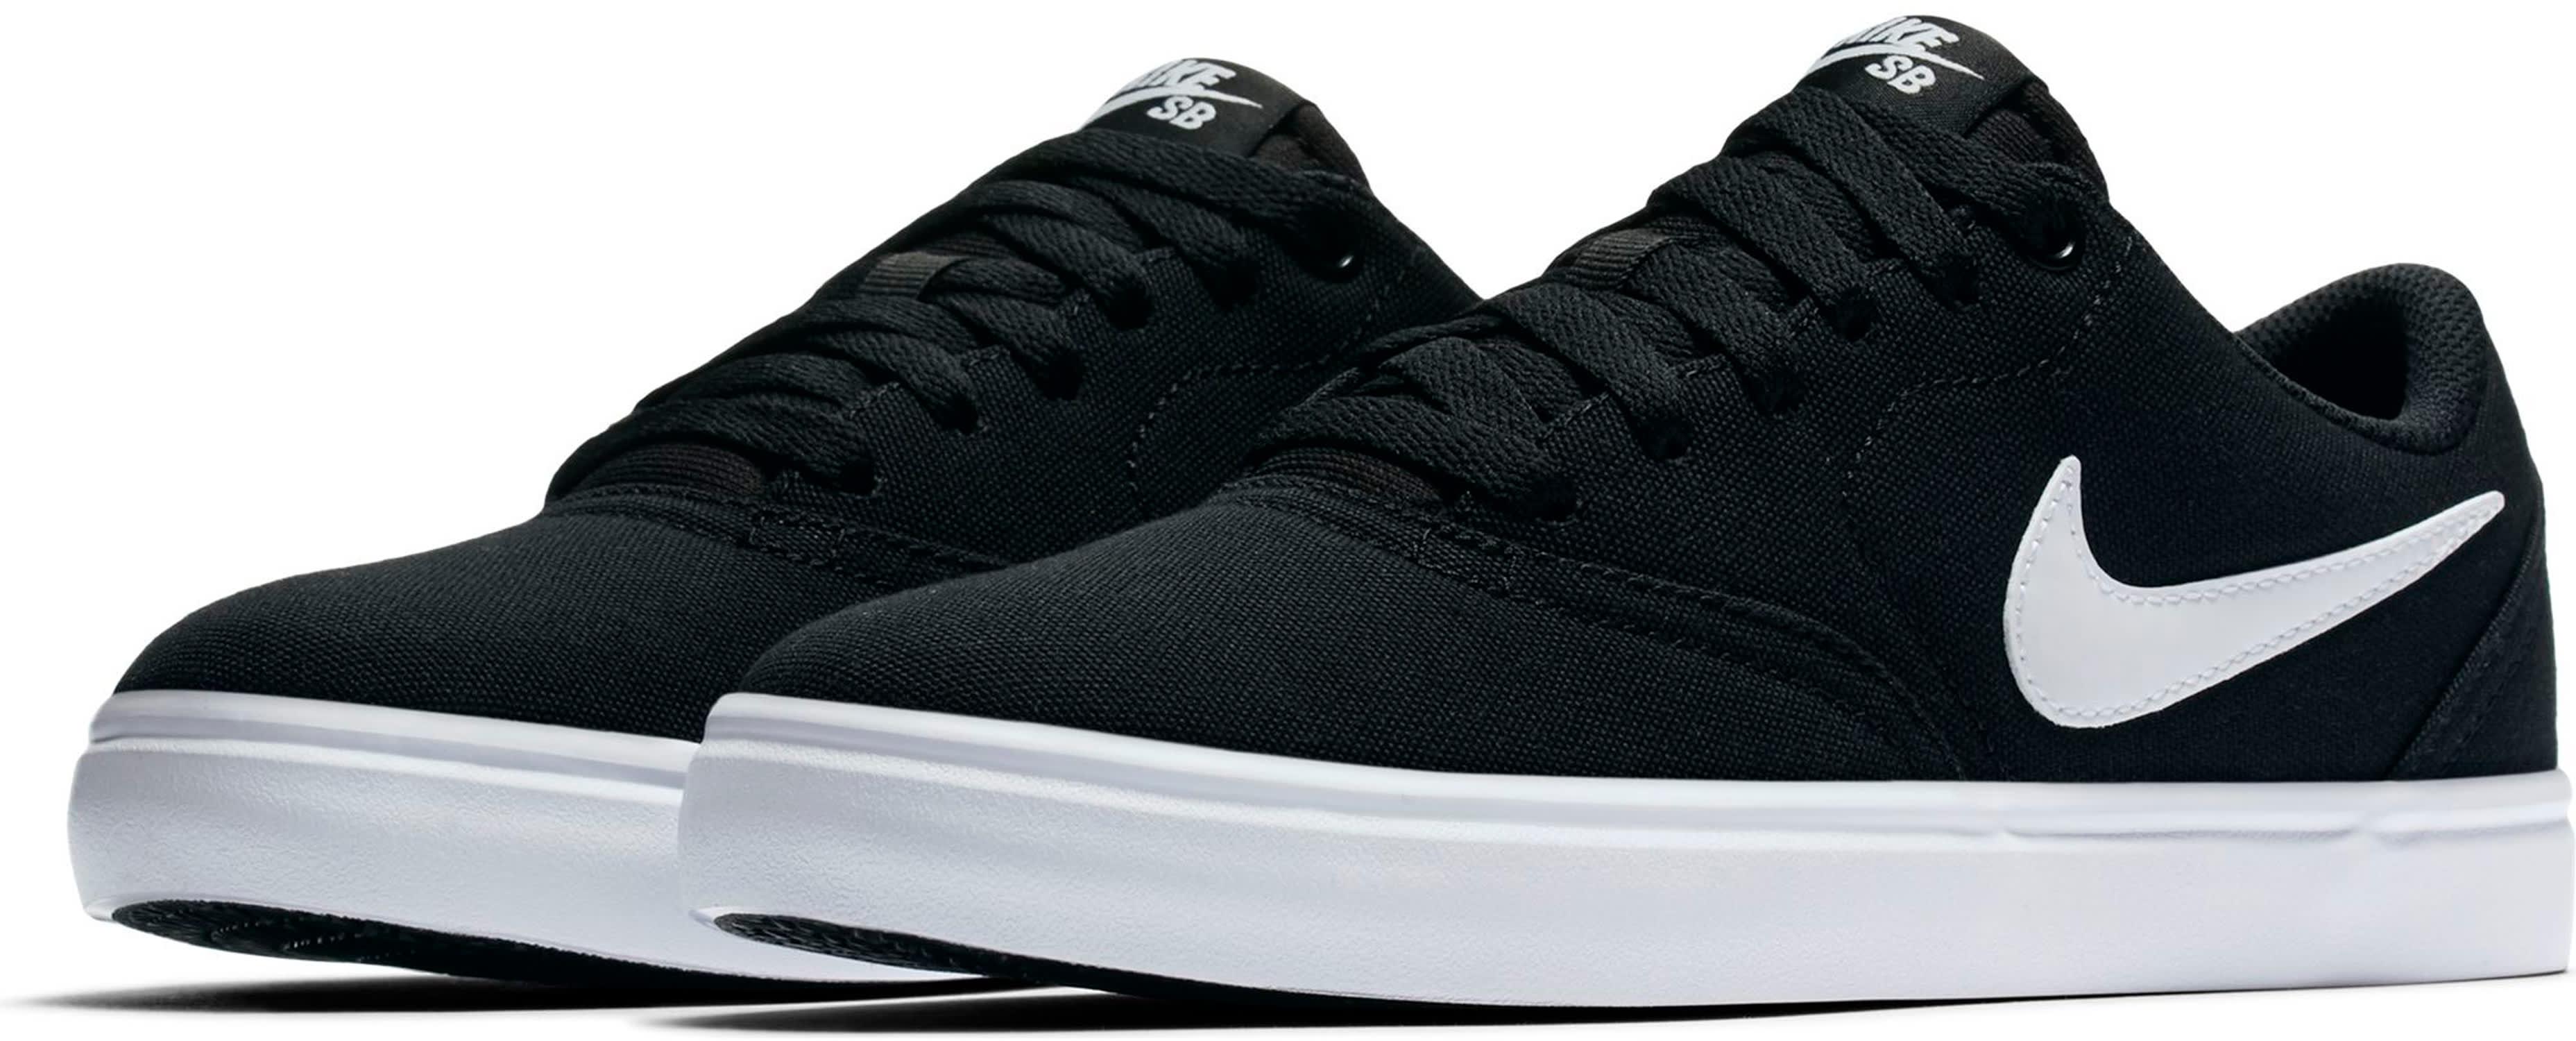 e6f0204af4 Nike SB Check Solarsoft Canvas Skate Shoes - thumbnail 3